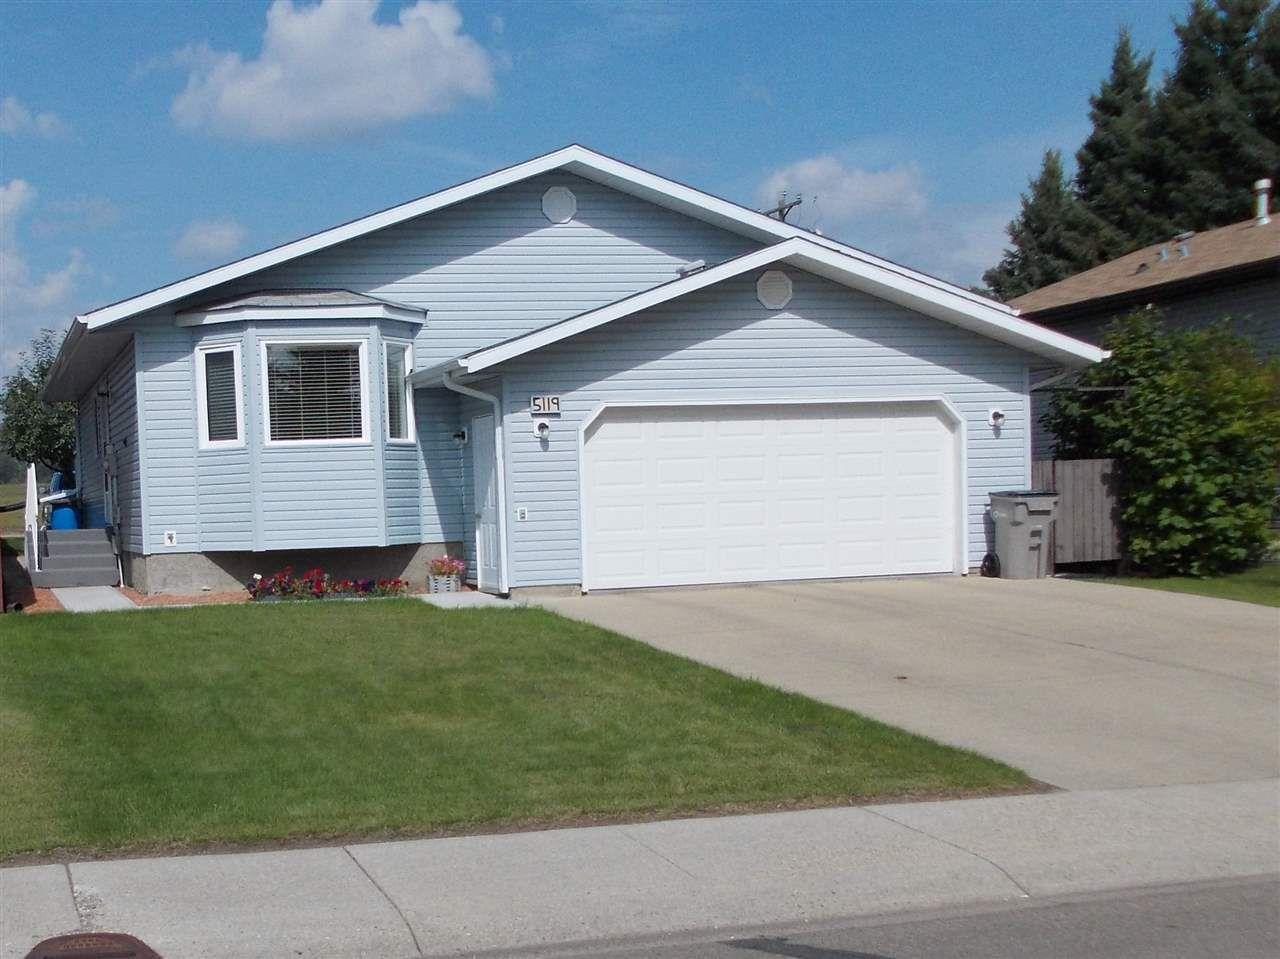 Main Photo: 5119 57 Avenue: Stony Plain House for sale : MLS®# E4132318